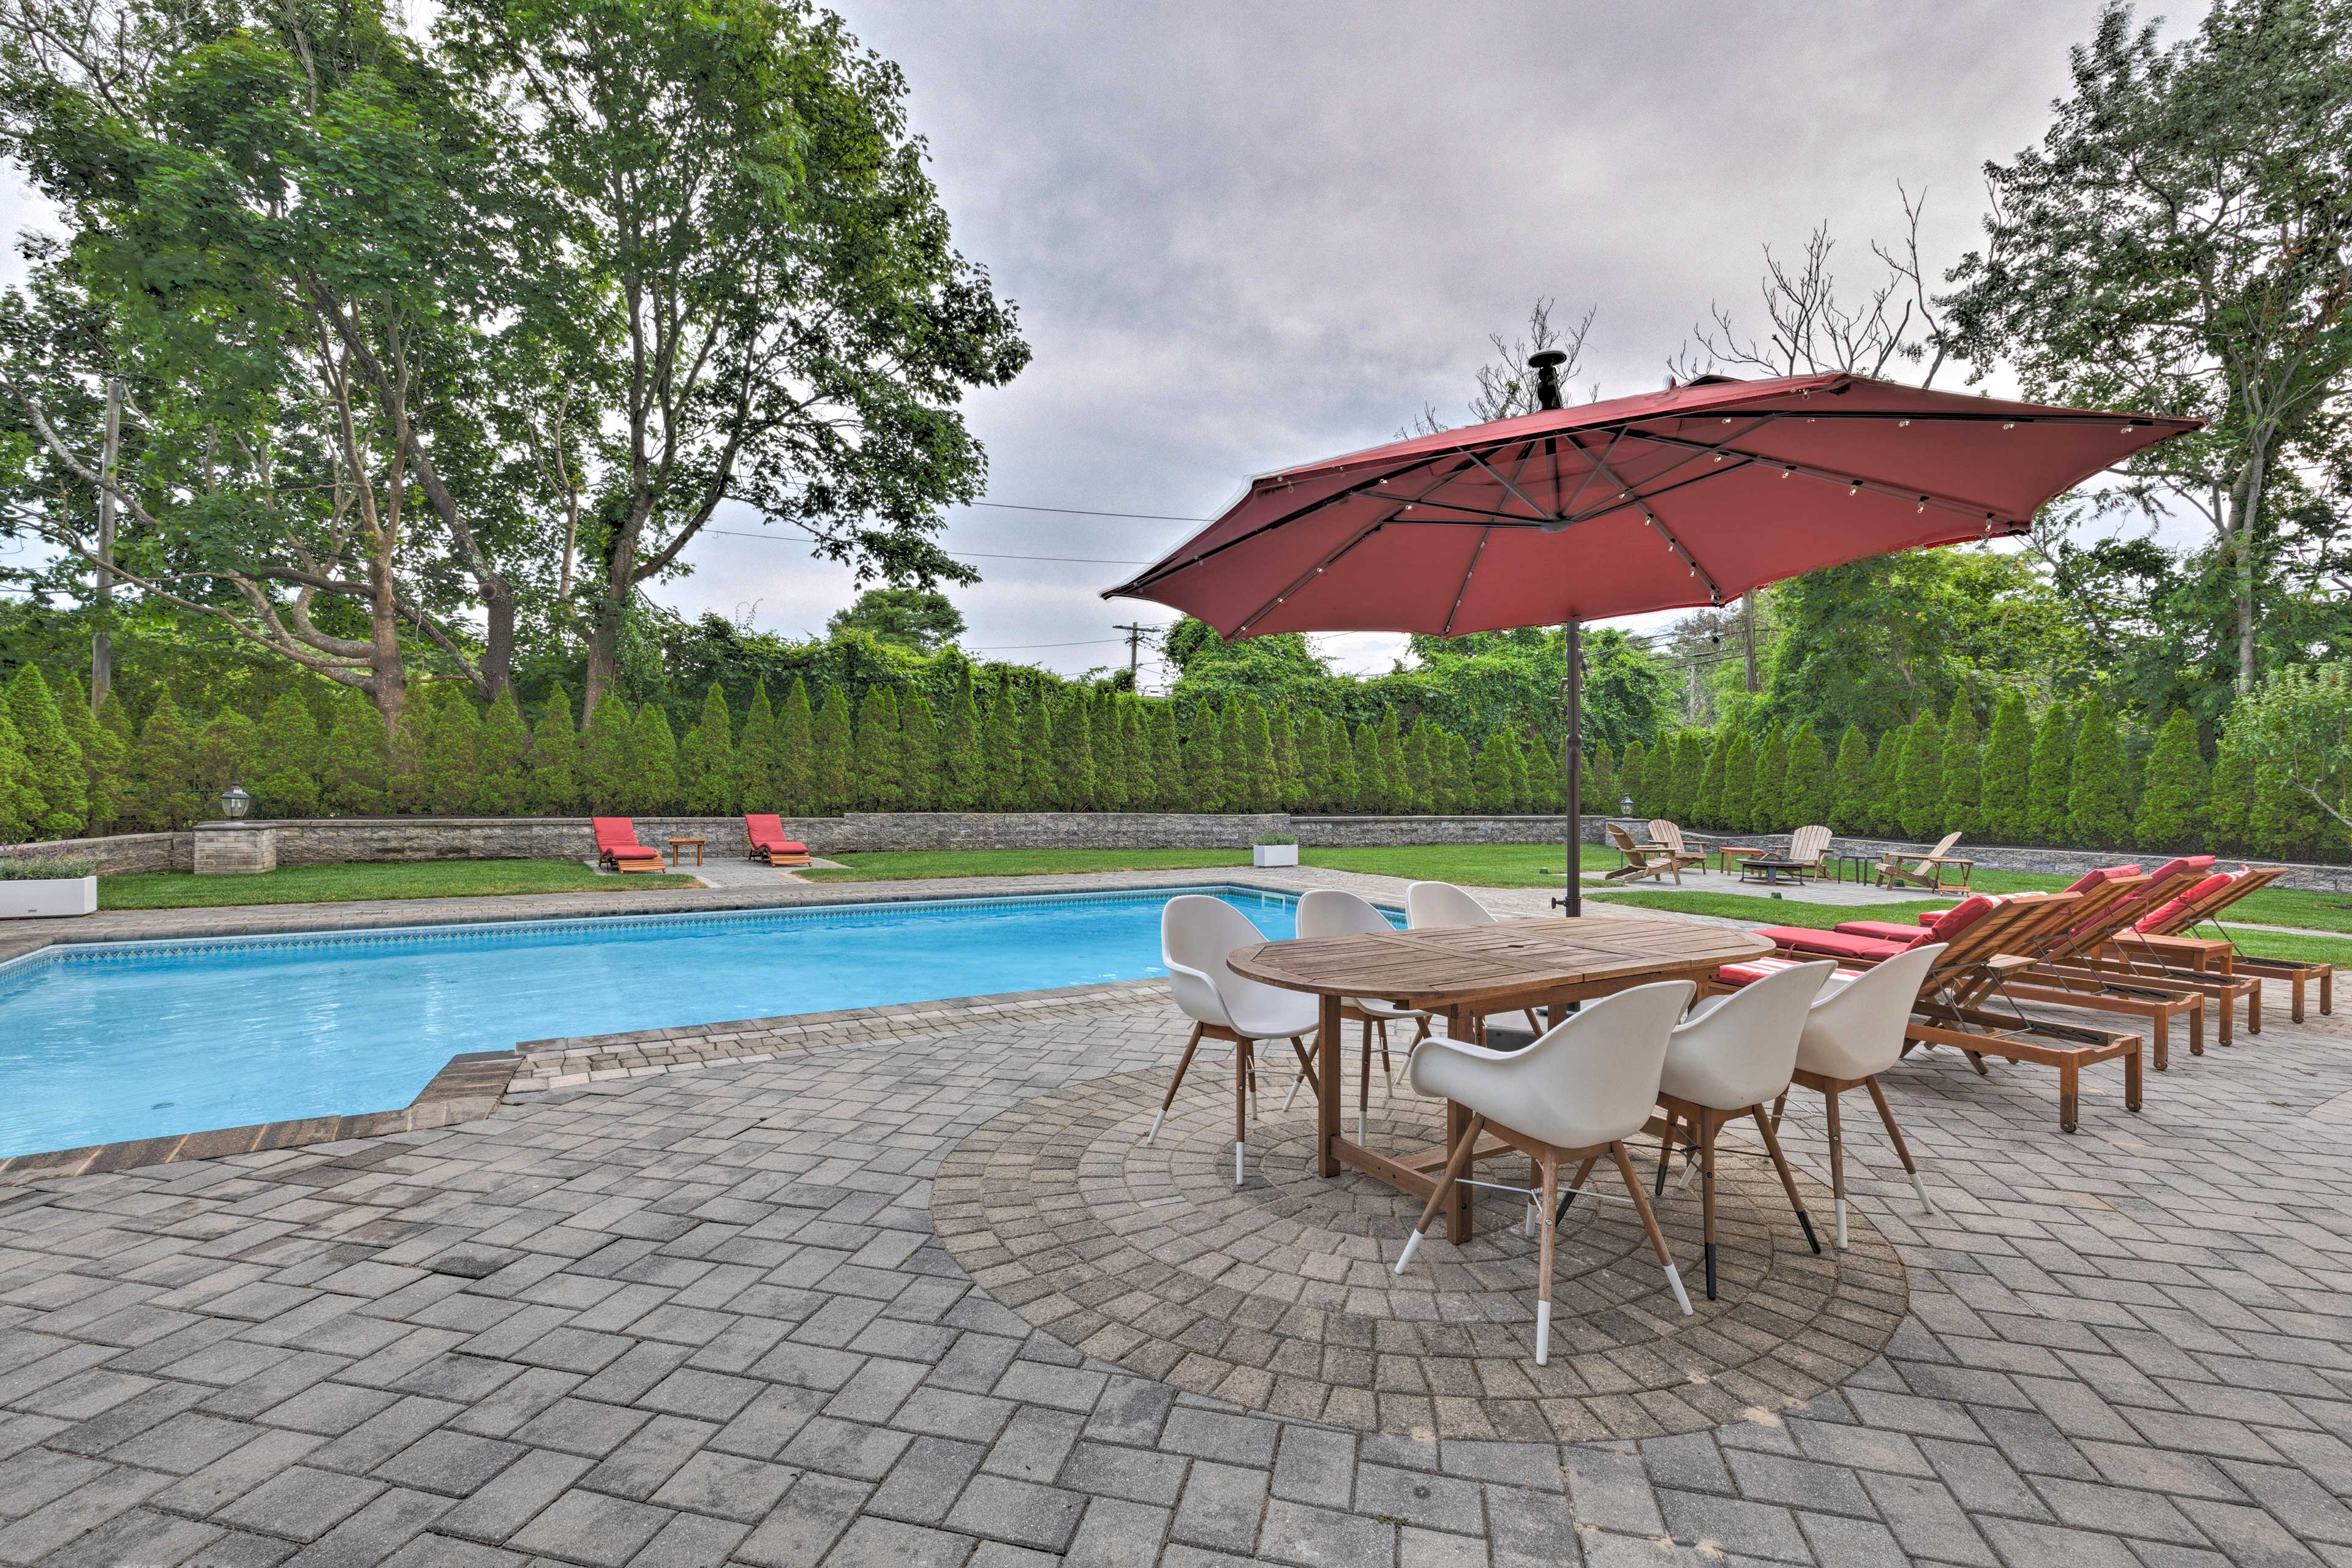 This fantastic 6-bedroom, 2-bath Hampton Bays home is the ideal getaway.